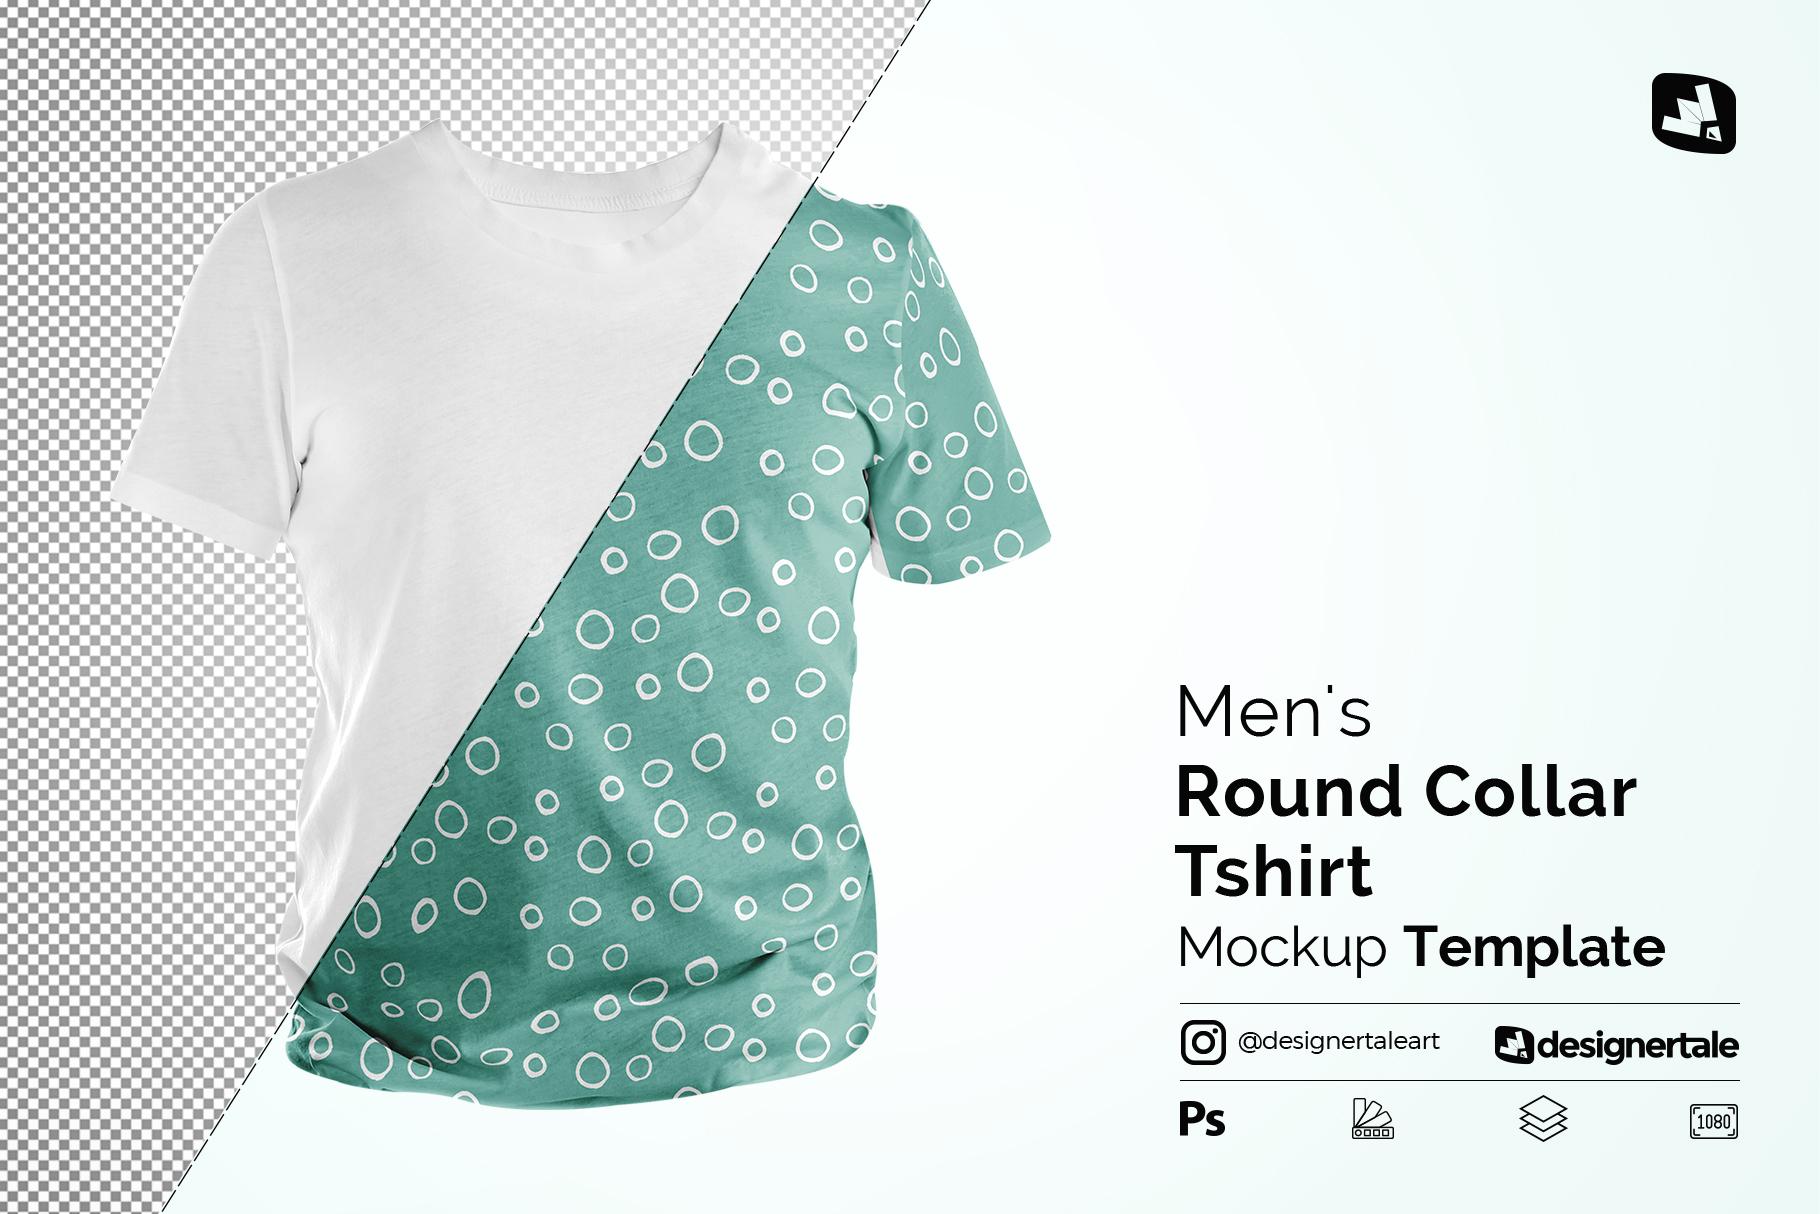 men's round collar tshirt mockup